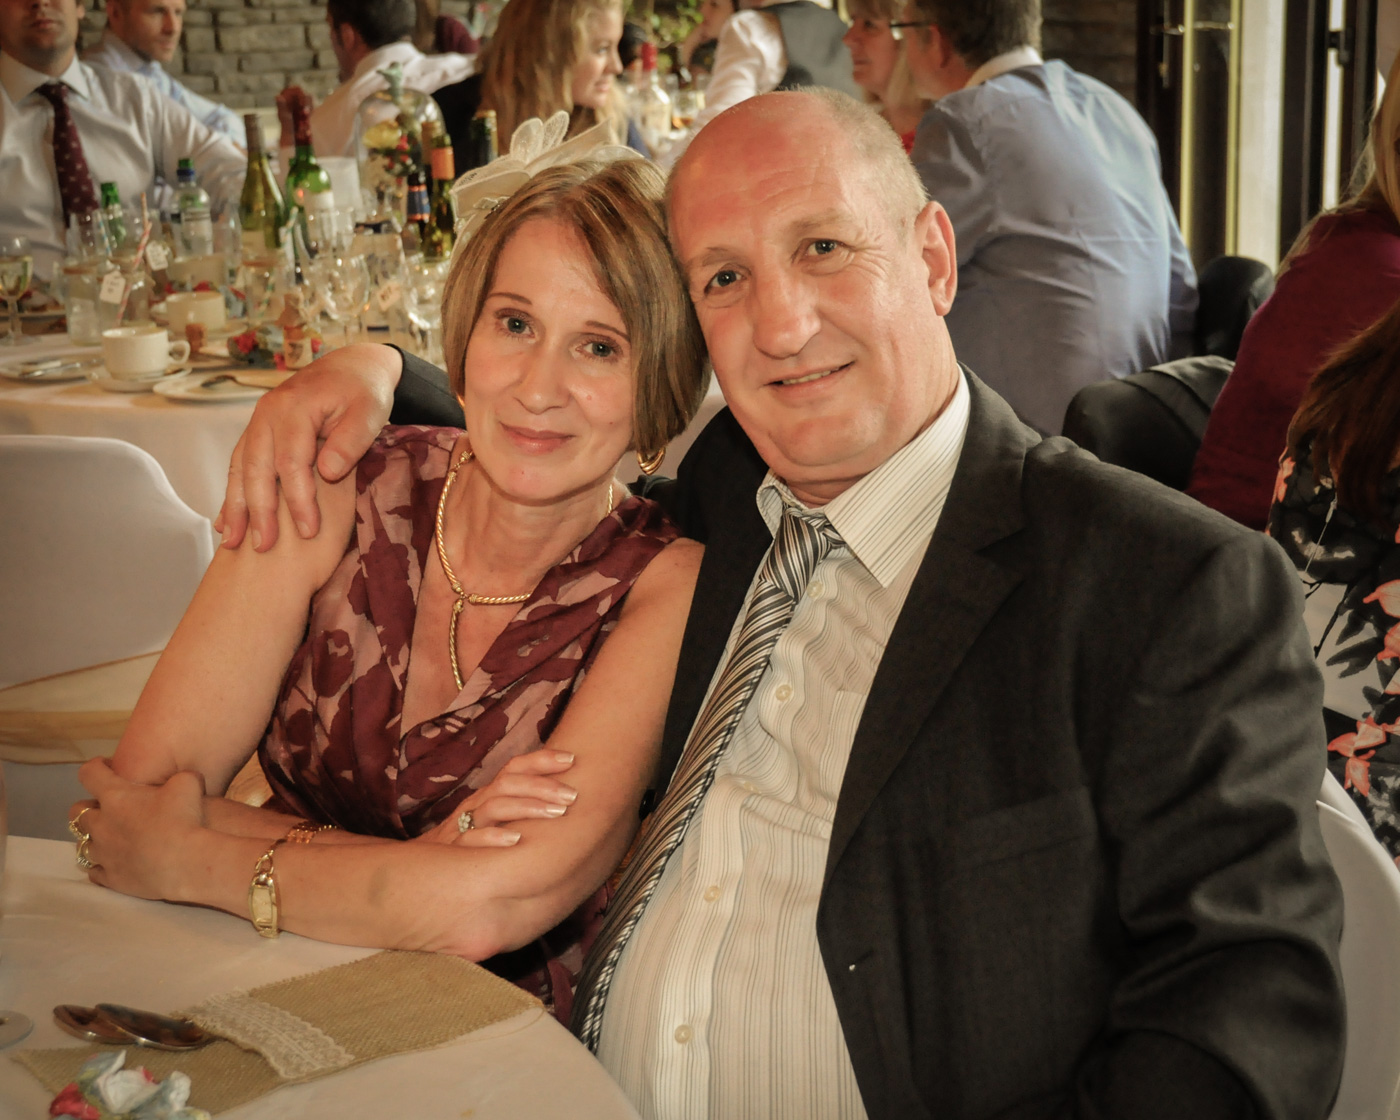 2014-07-19 Angela and Stuart174239.jpg